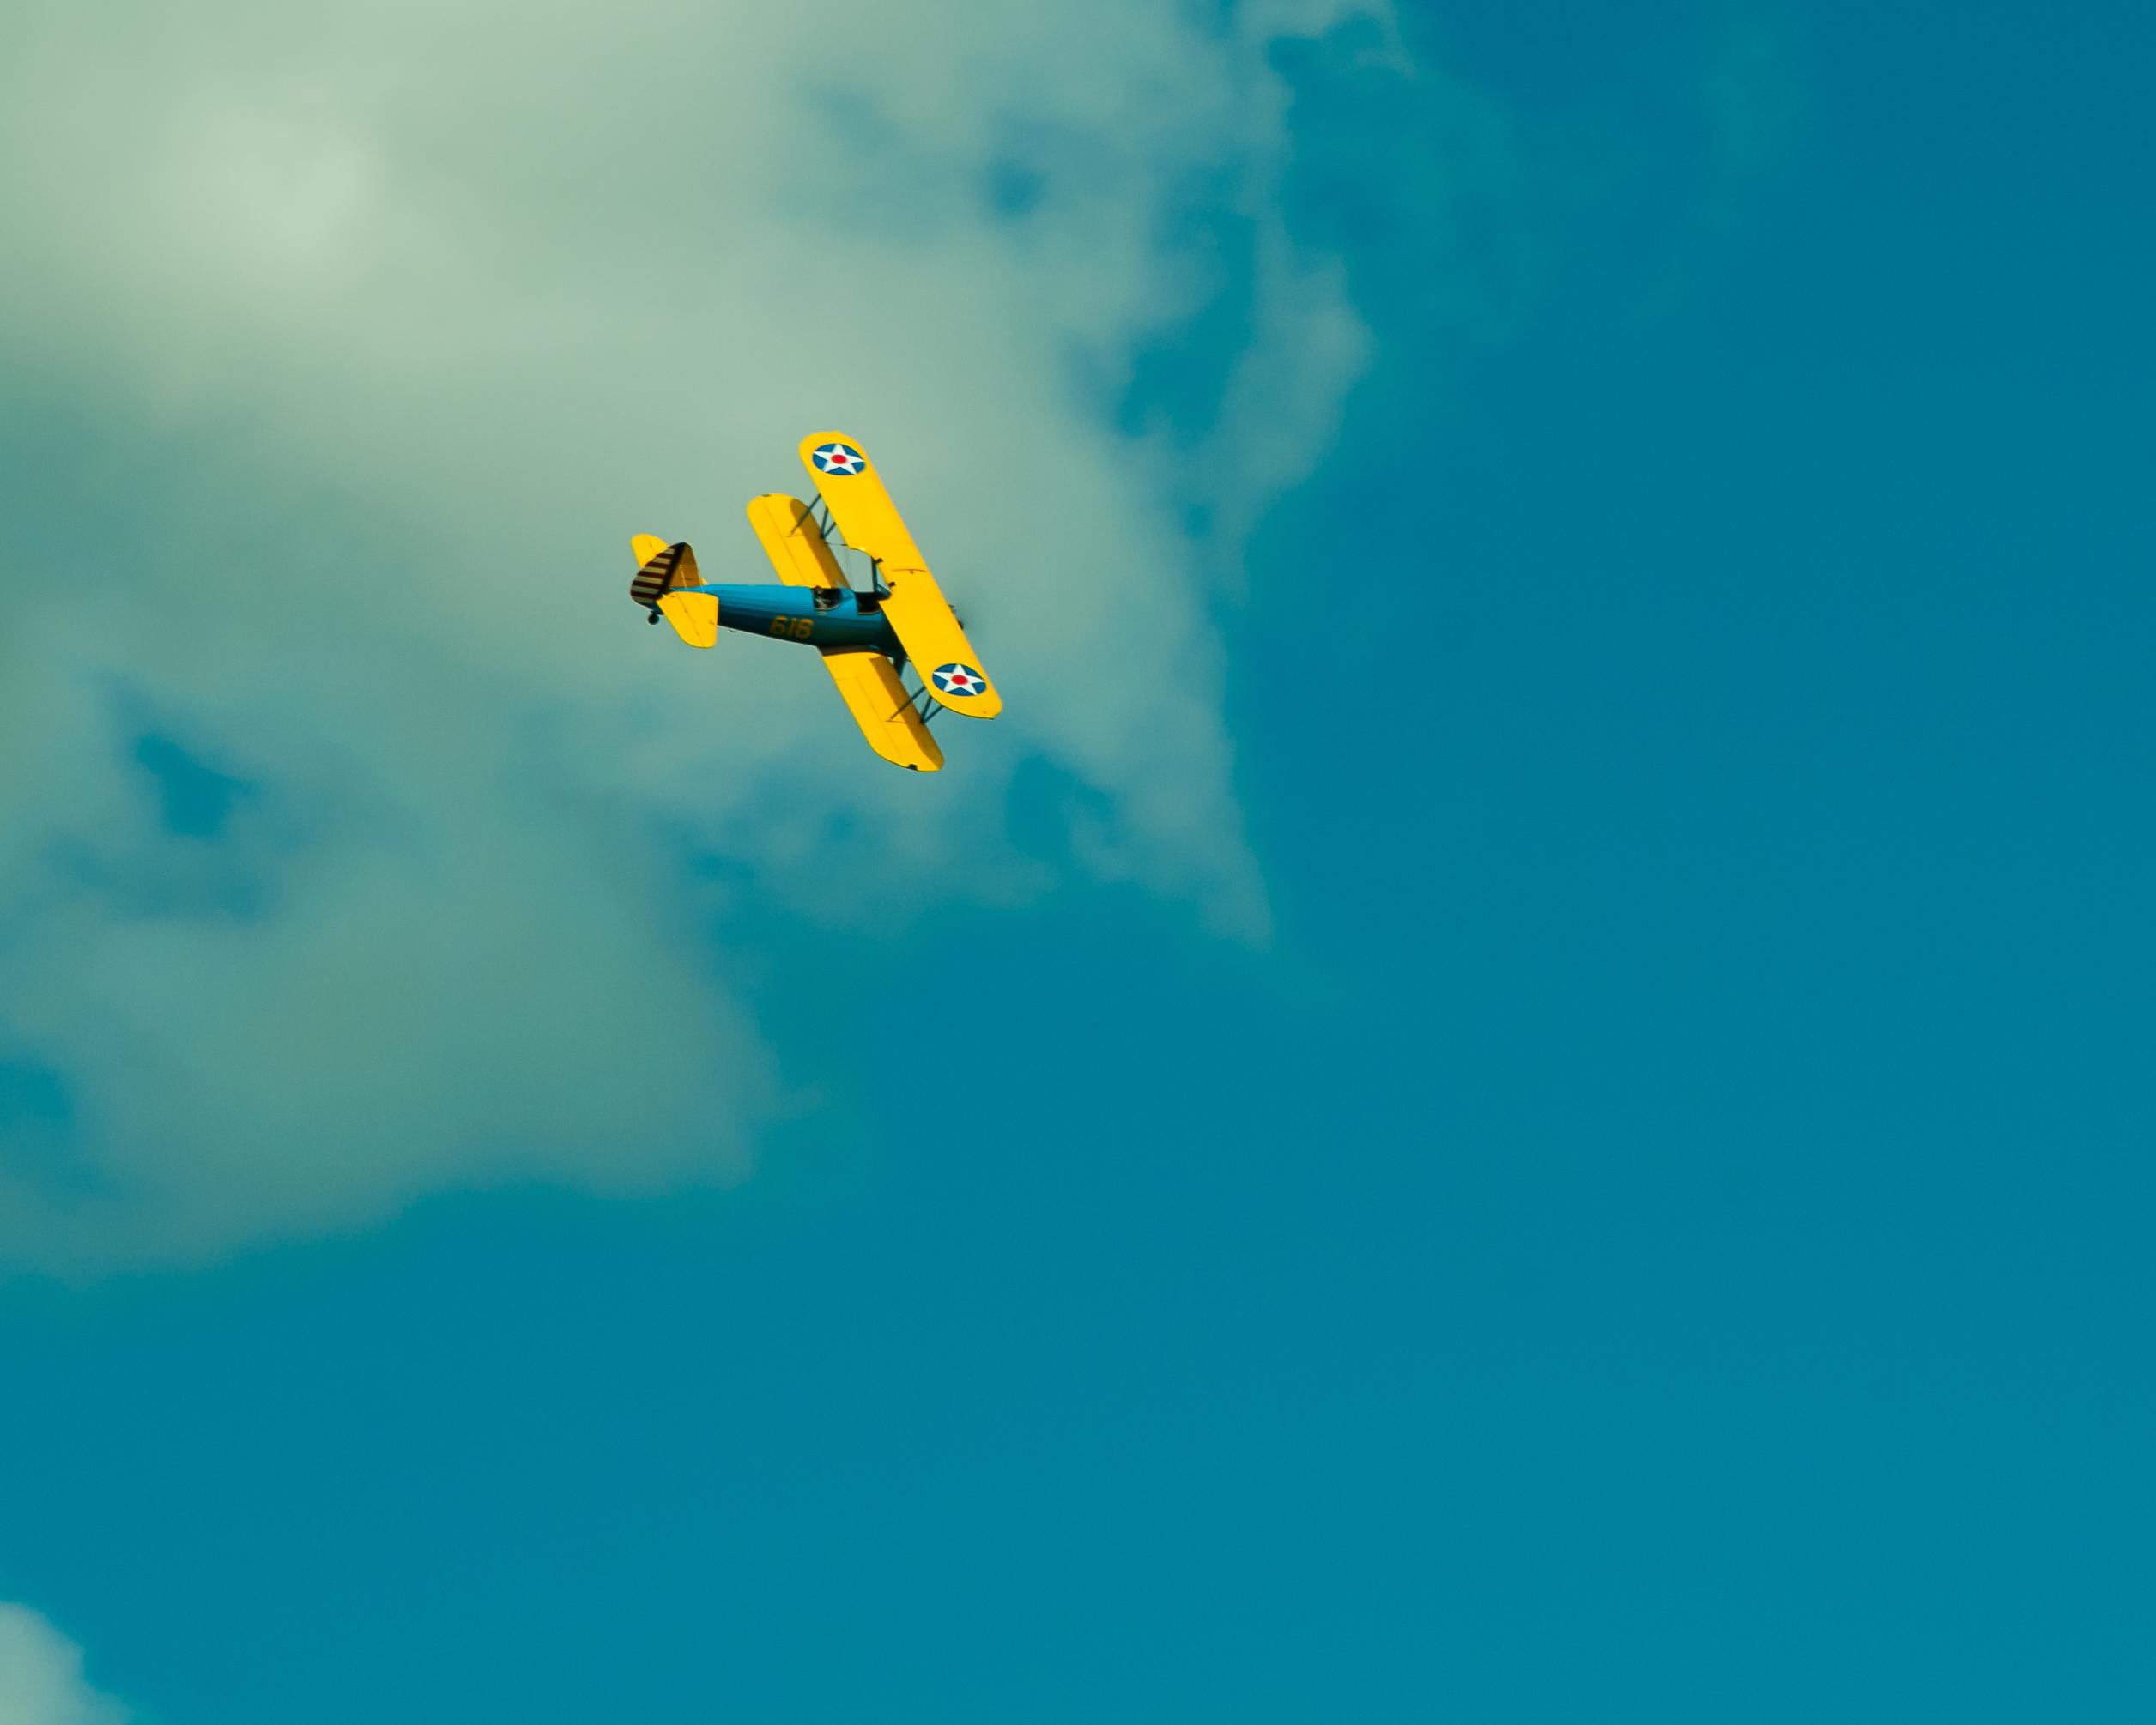 # - 159 - 616 - Blue & Yellow